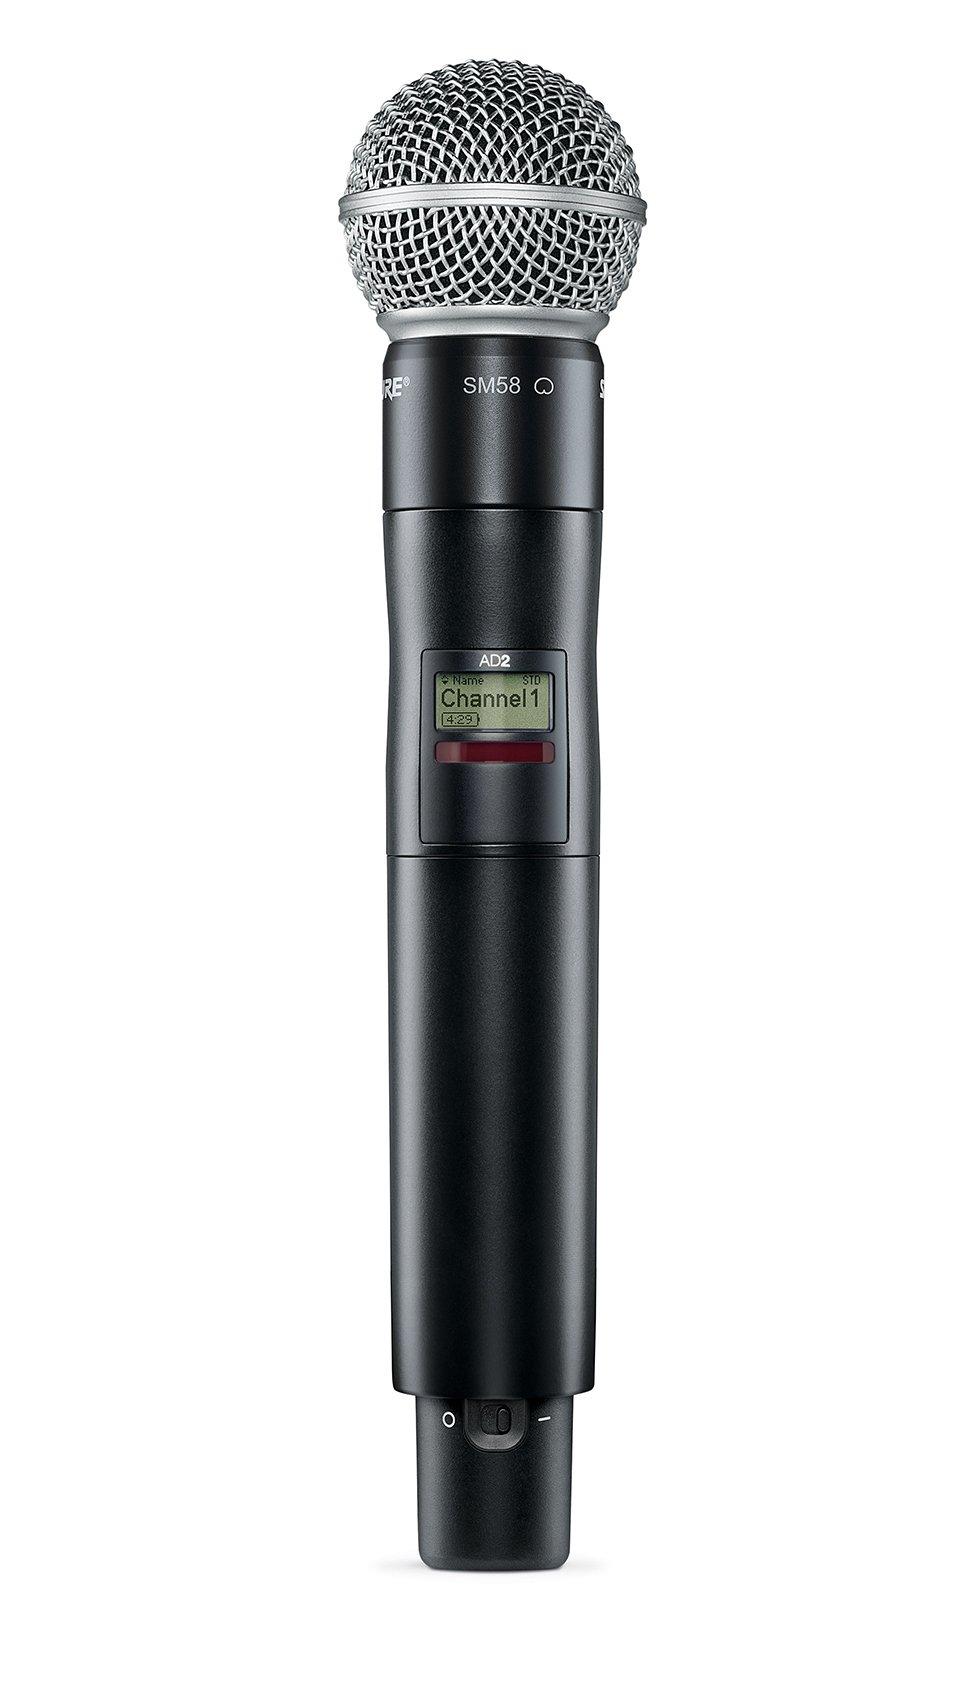 Shure AD2/SM58 Axient Digital Handheld Transmitter w/SM58 Capsule AD2/SM58